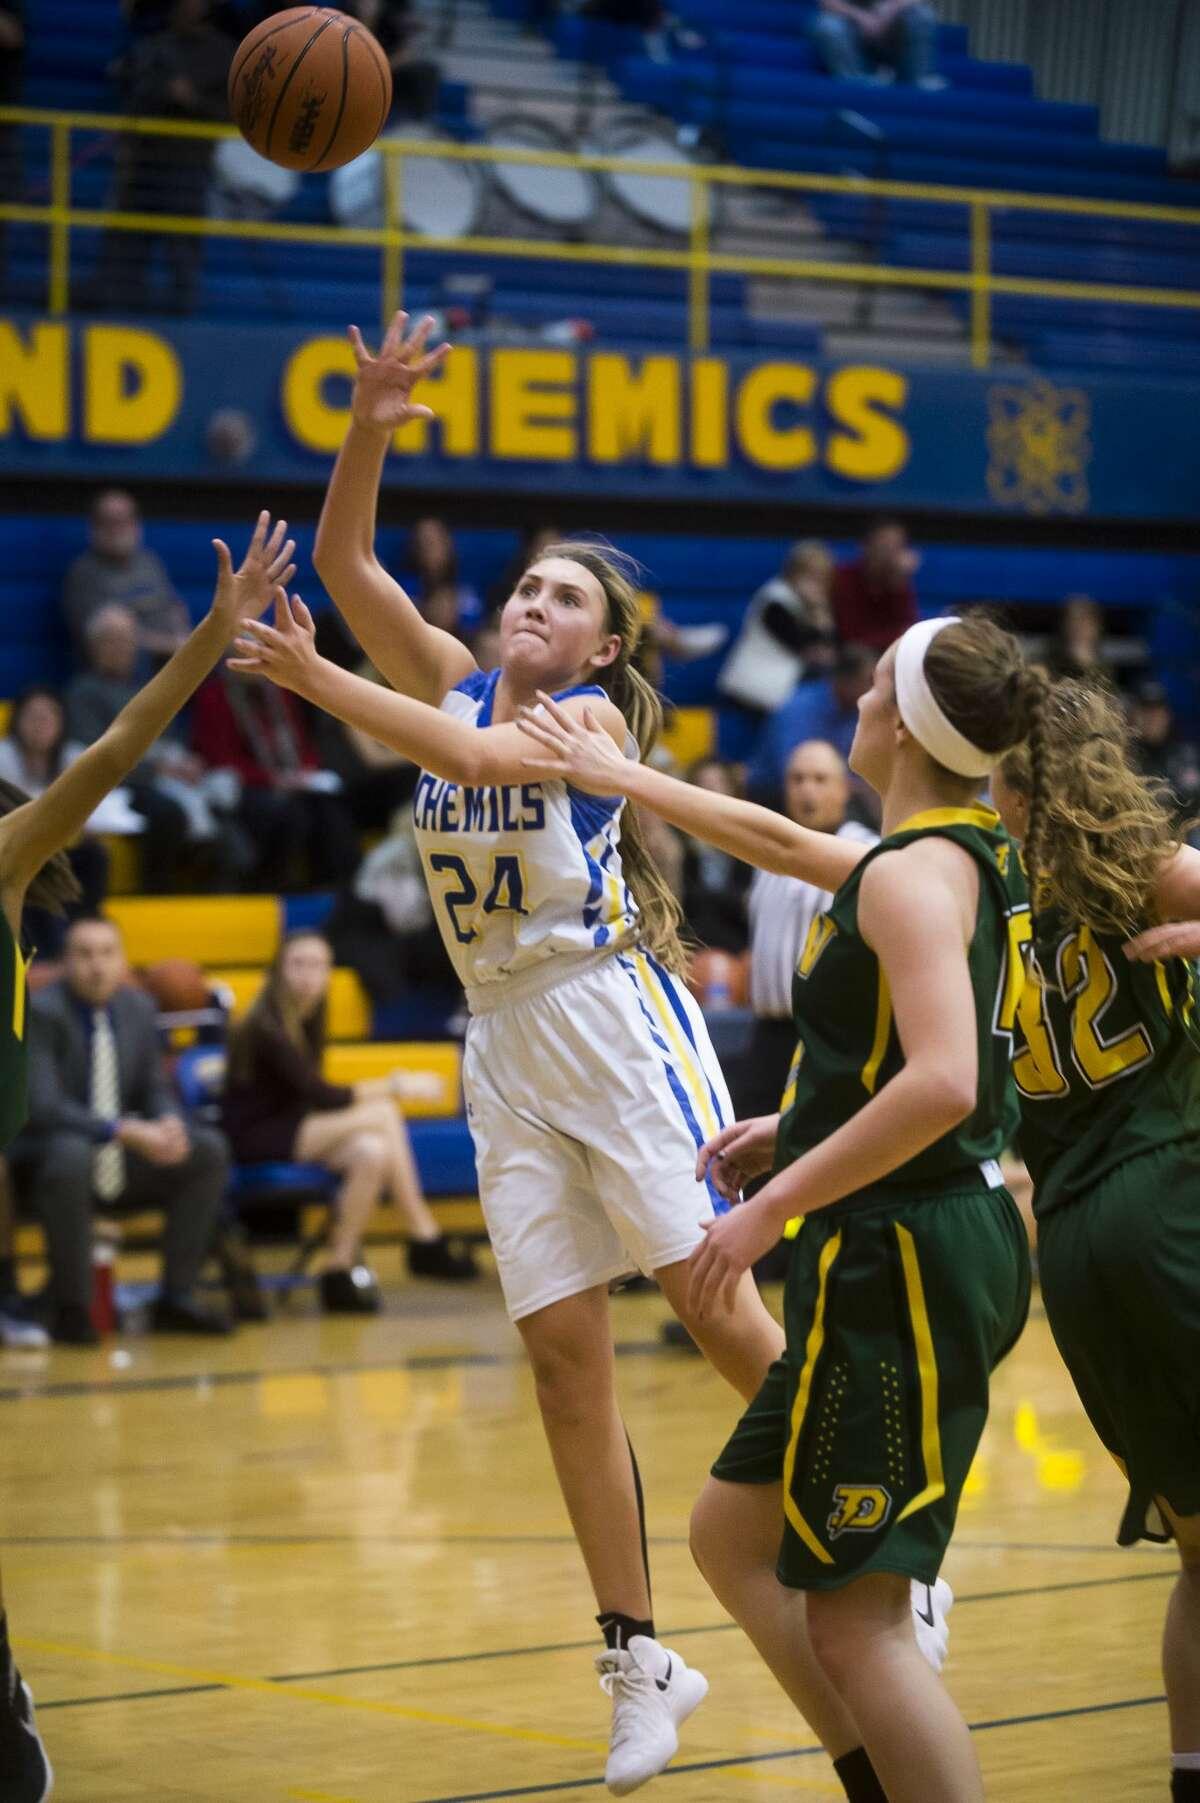 Midland senior Hannah Smith takes a shot during the Chemics' game against Dow on Tuesday, Dec. 19, 2017 at Midland High School. (Katy Kildee/kkildee@mdn.net)